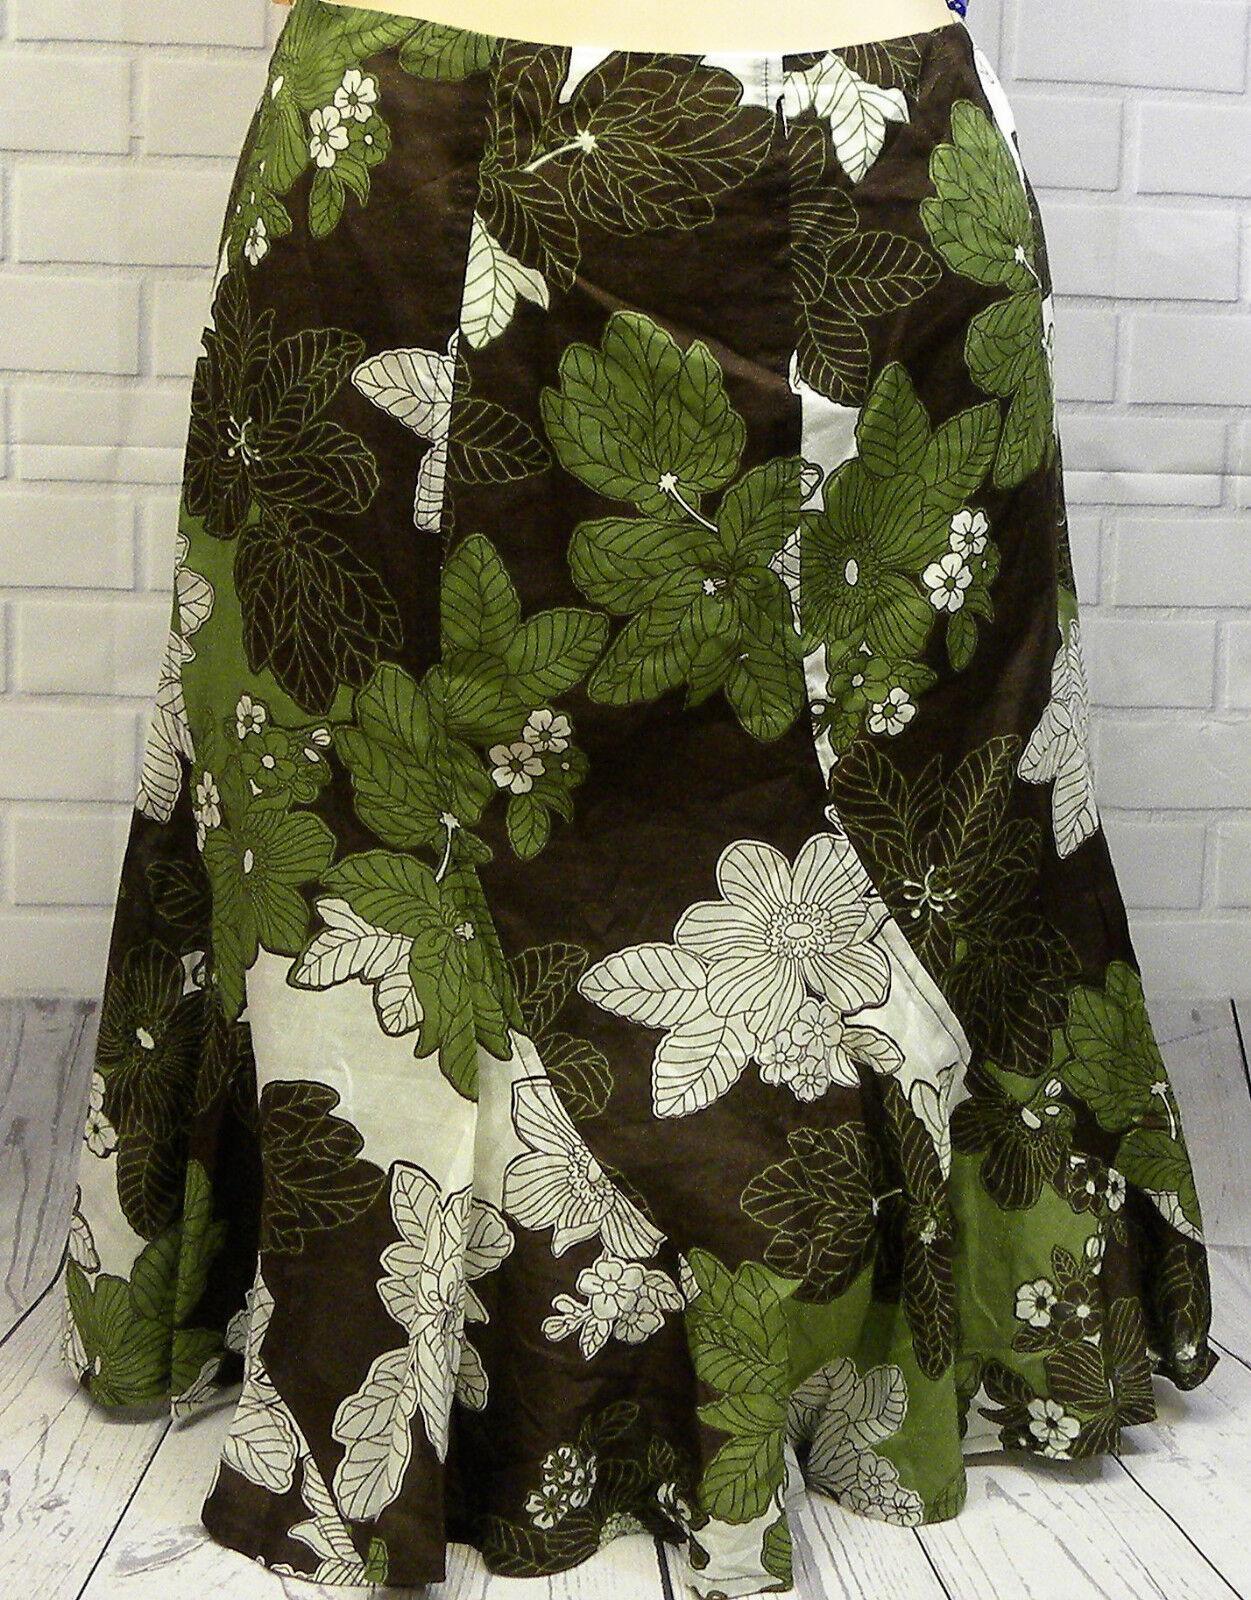 Jones New York Sport Green Floral Lined Skirt Concealed Side Zip Ruffle Hem 10P